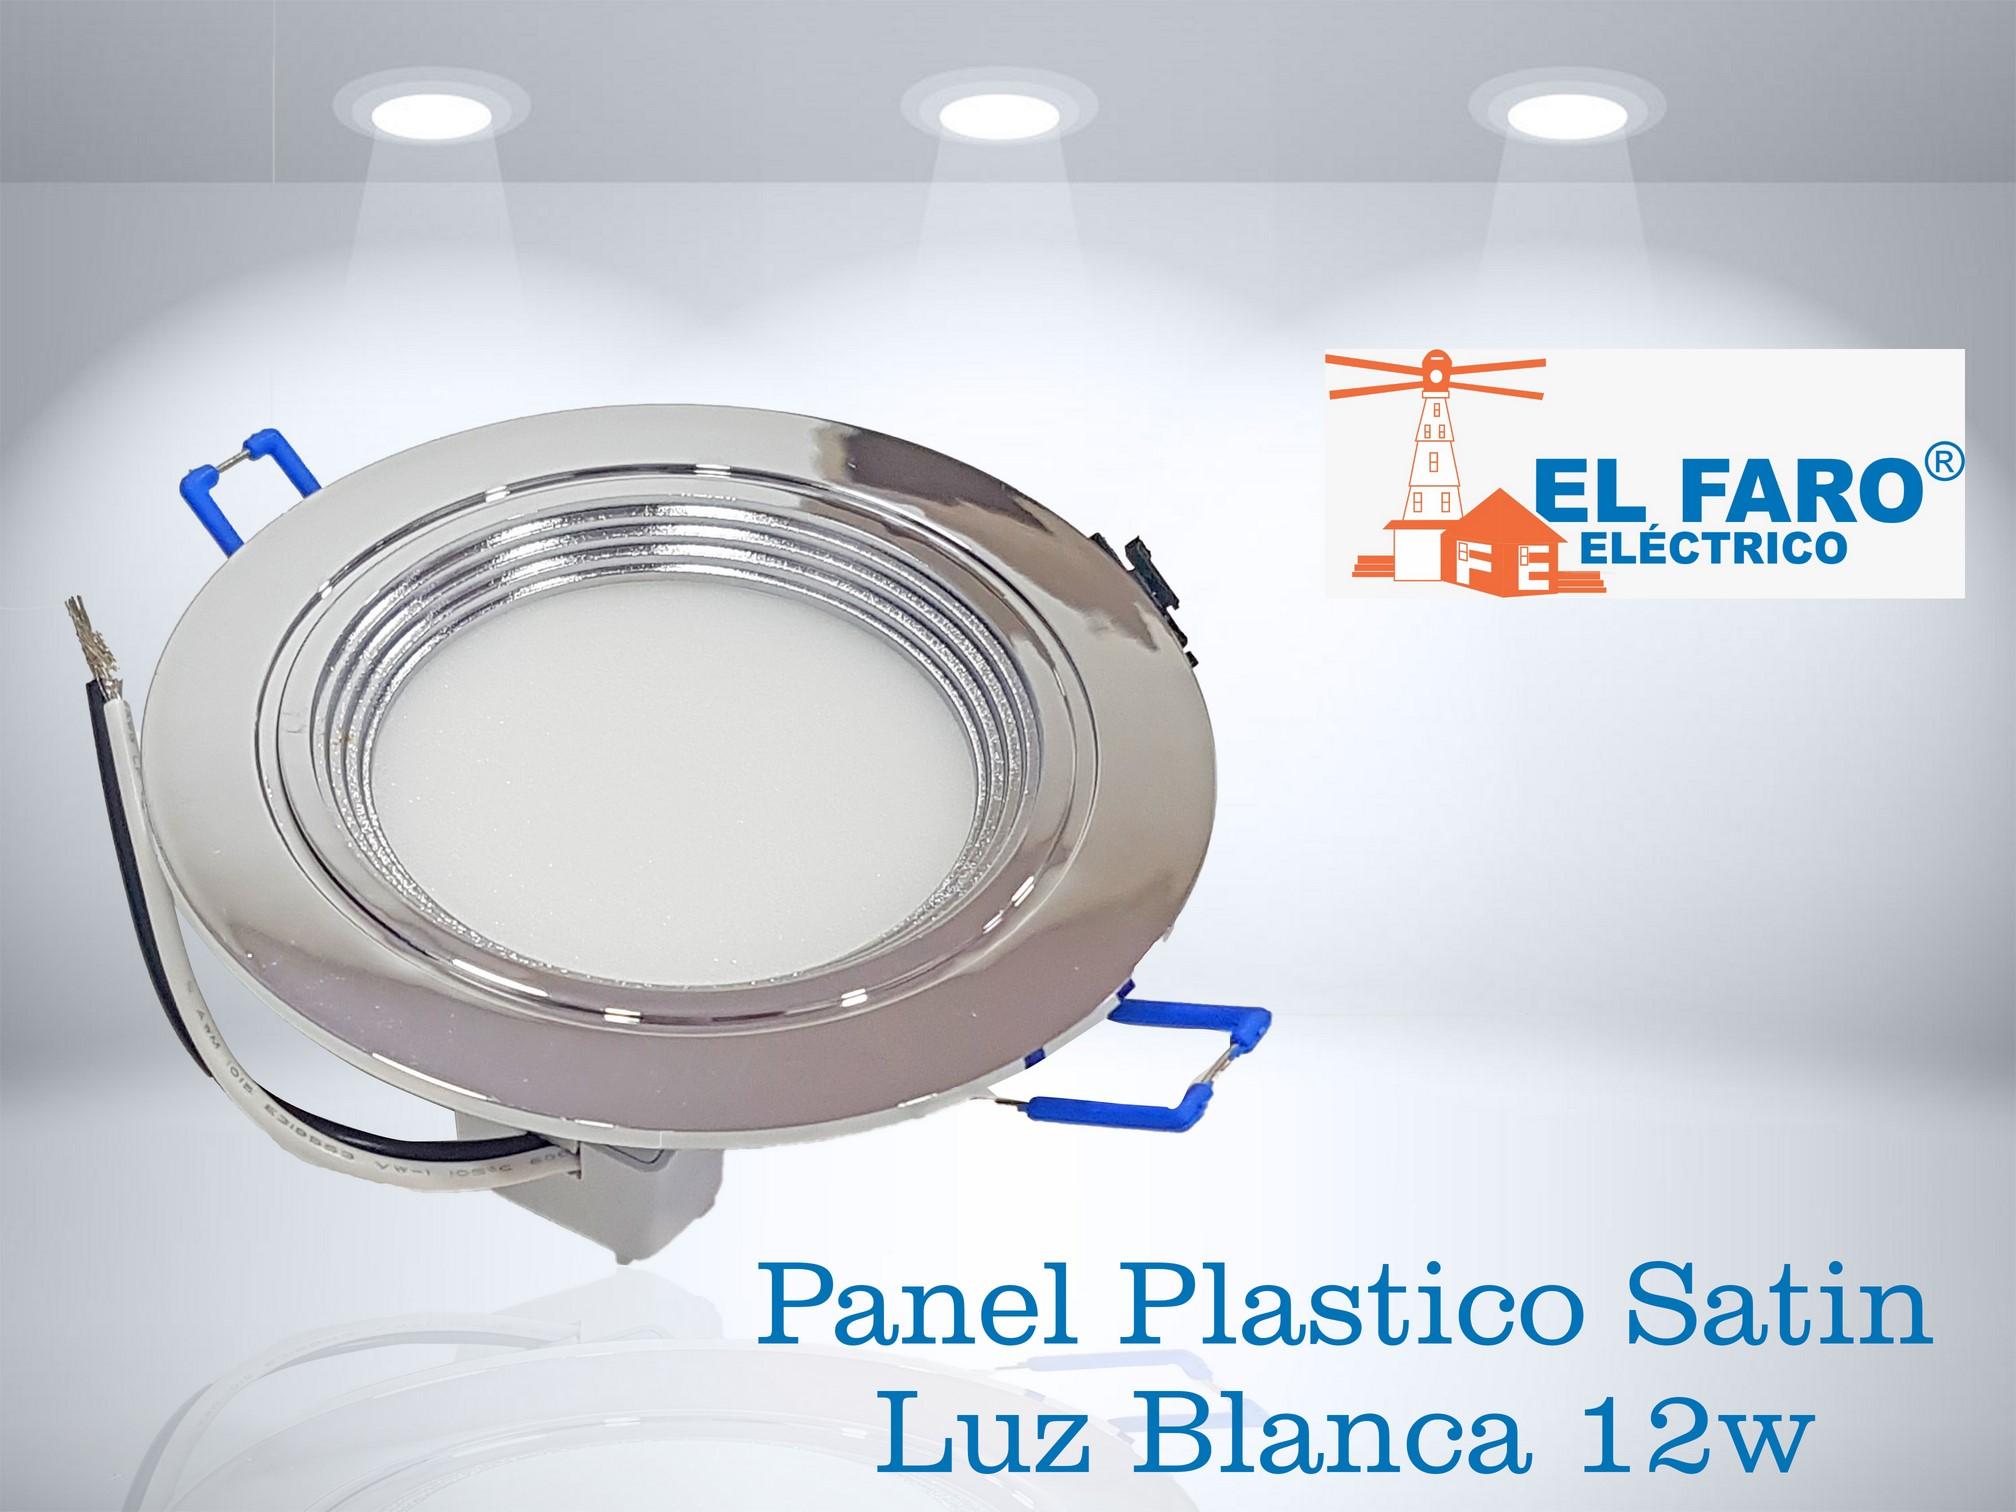 Panel plástico satin luz blanca 12w